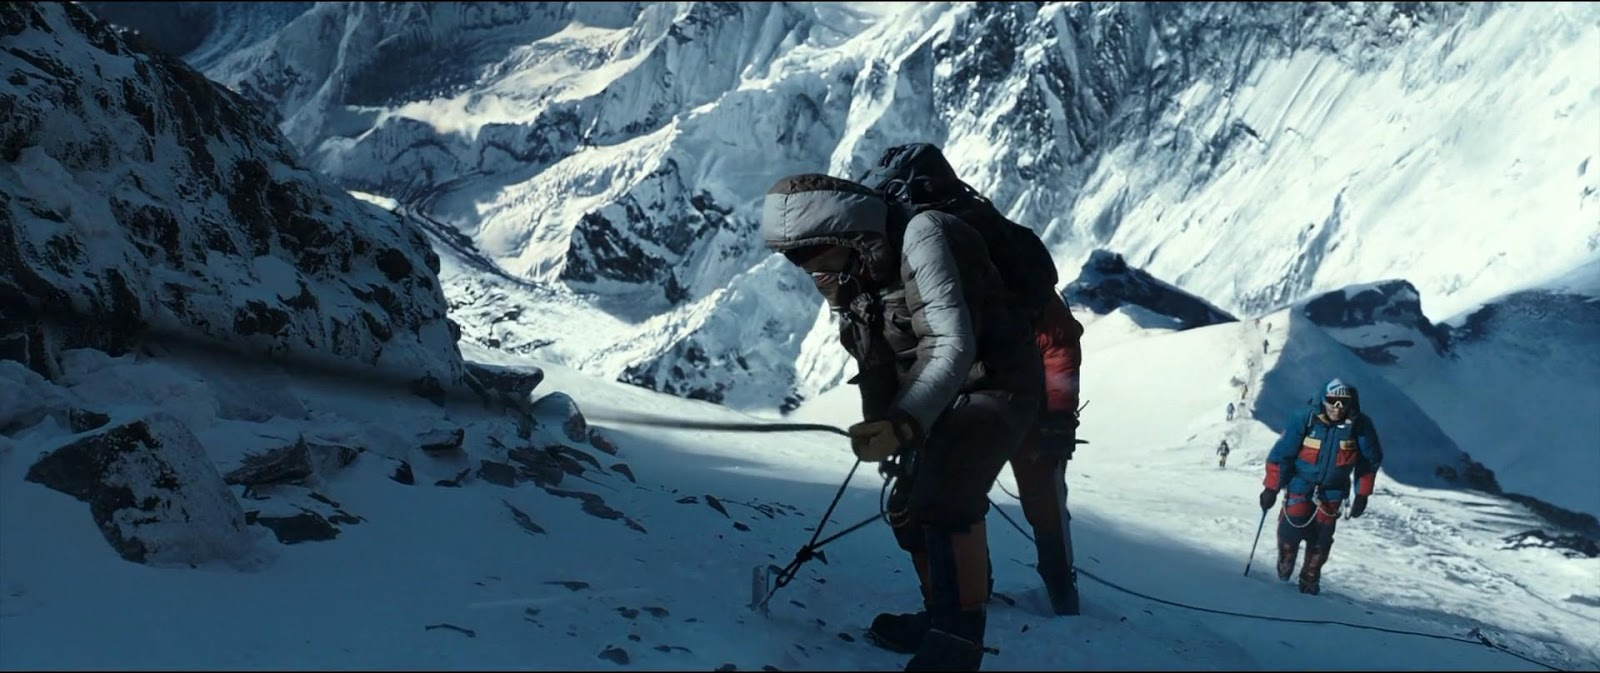 Everest (2015) 4